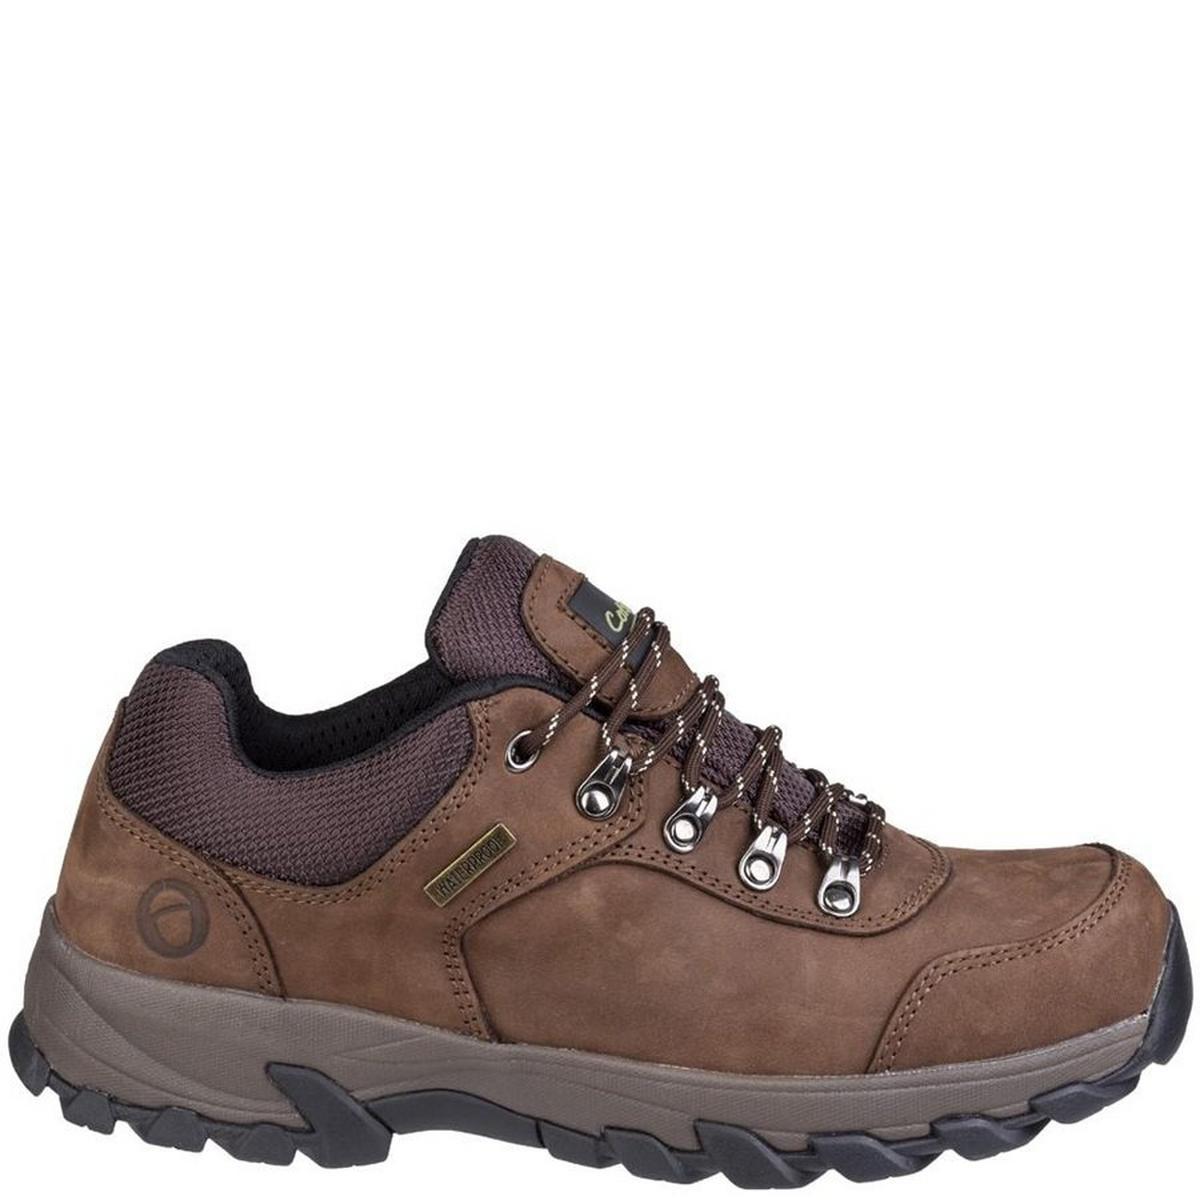 Cotswold Men's Hawling Shoe